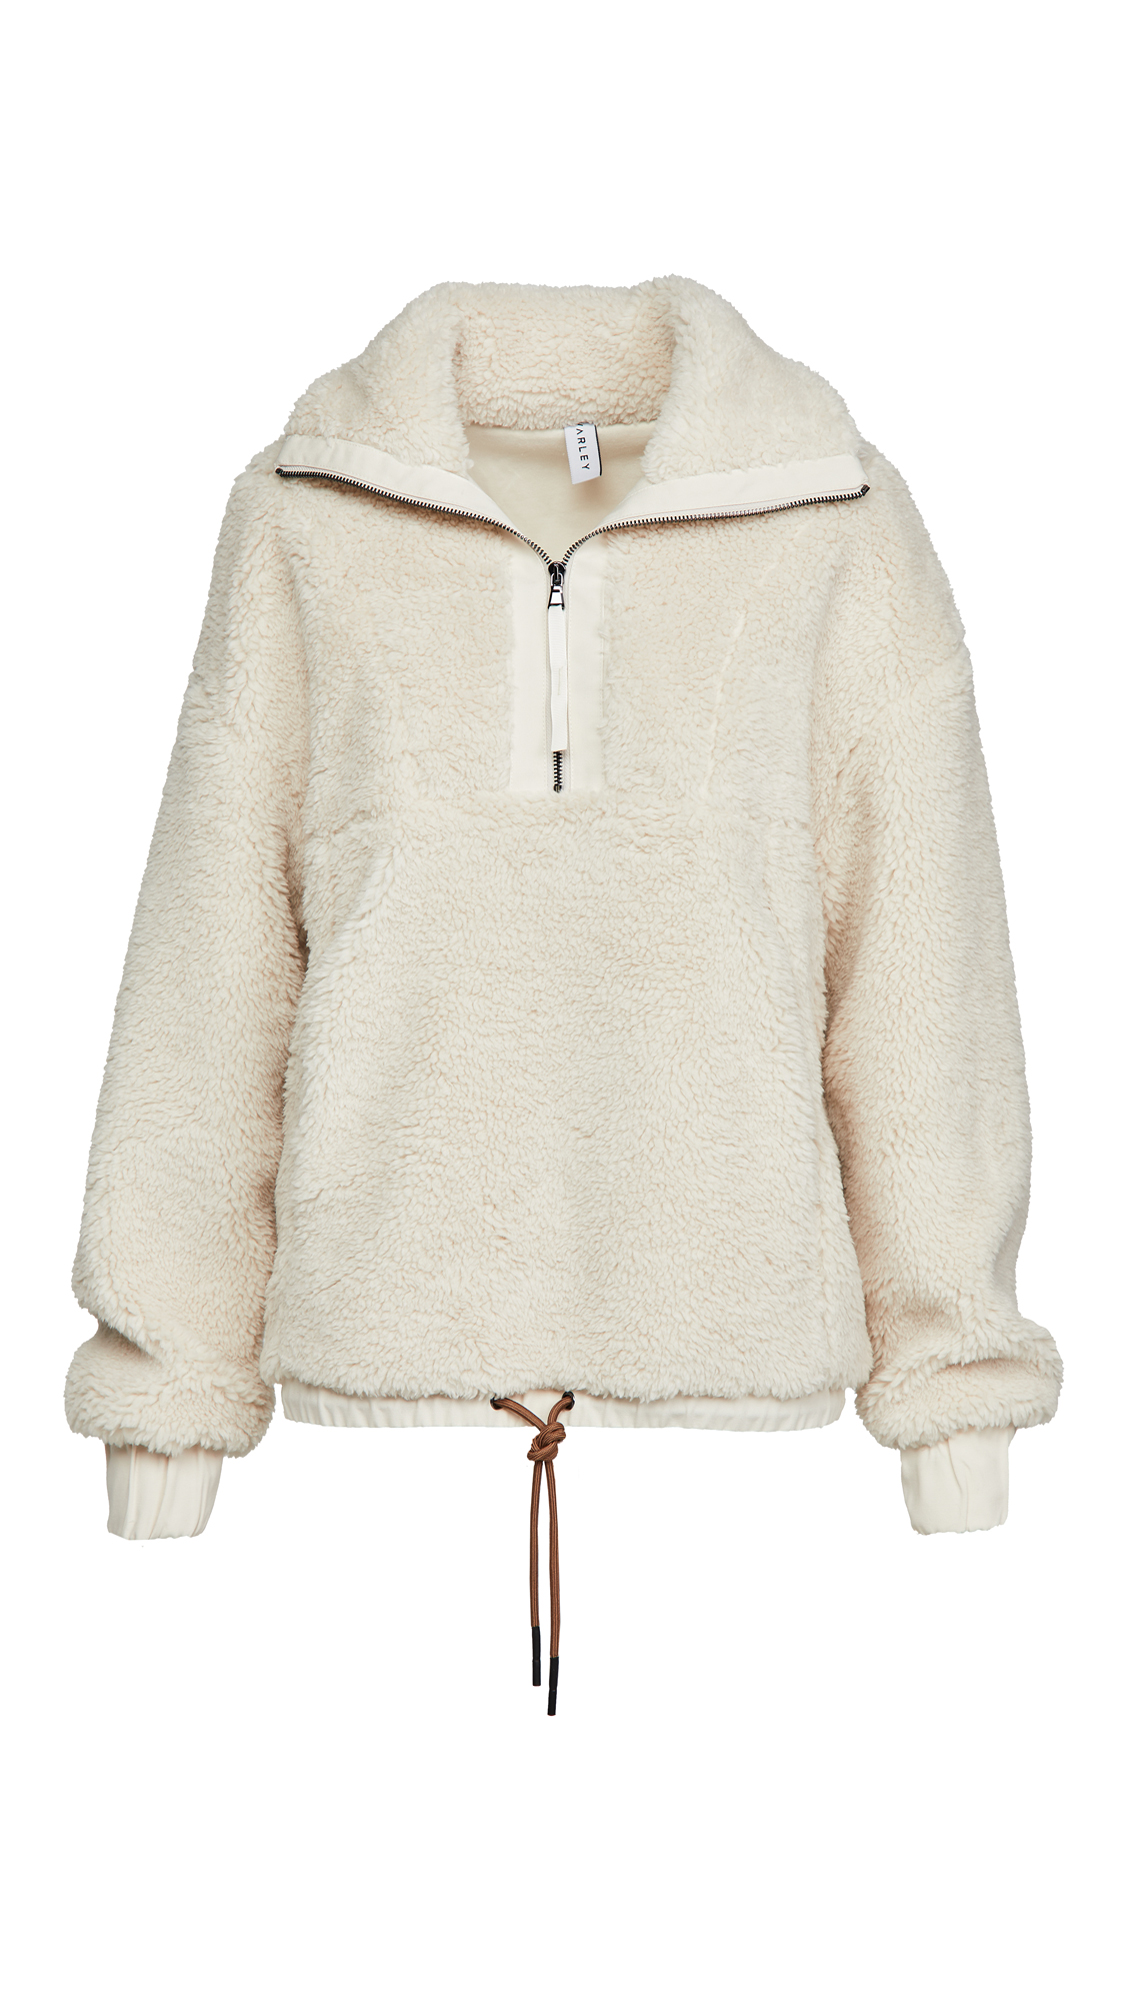 Varley Appleton Sweatshirt